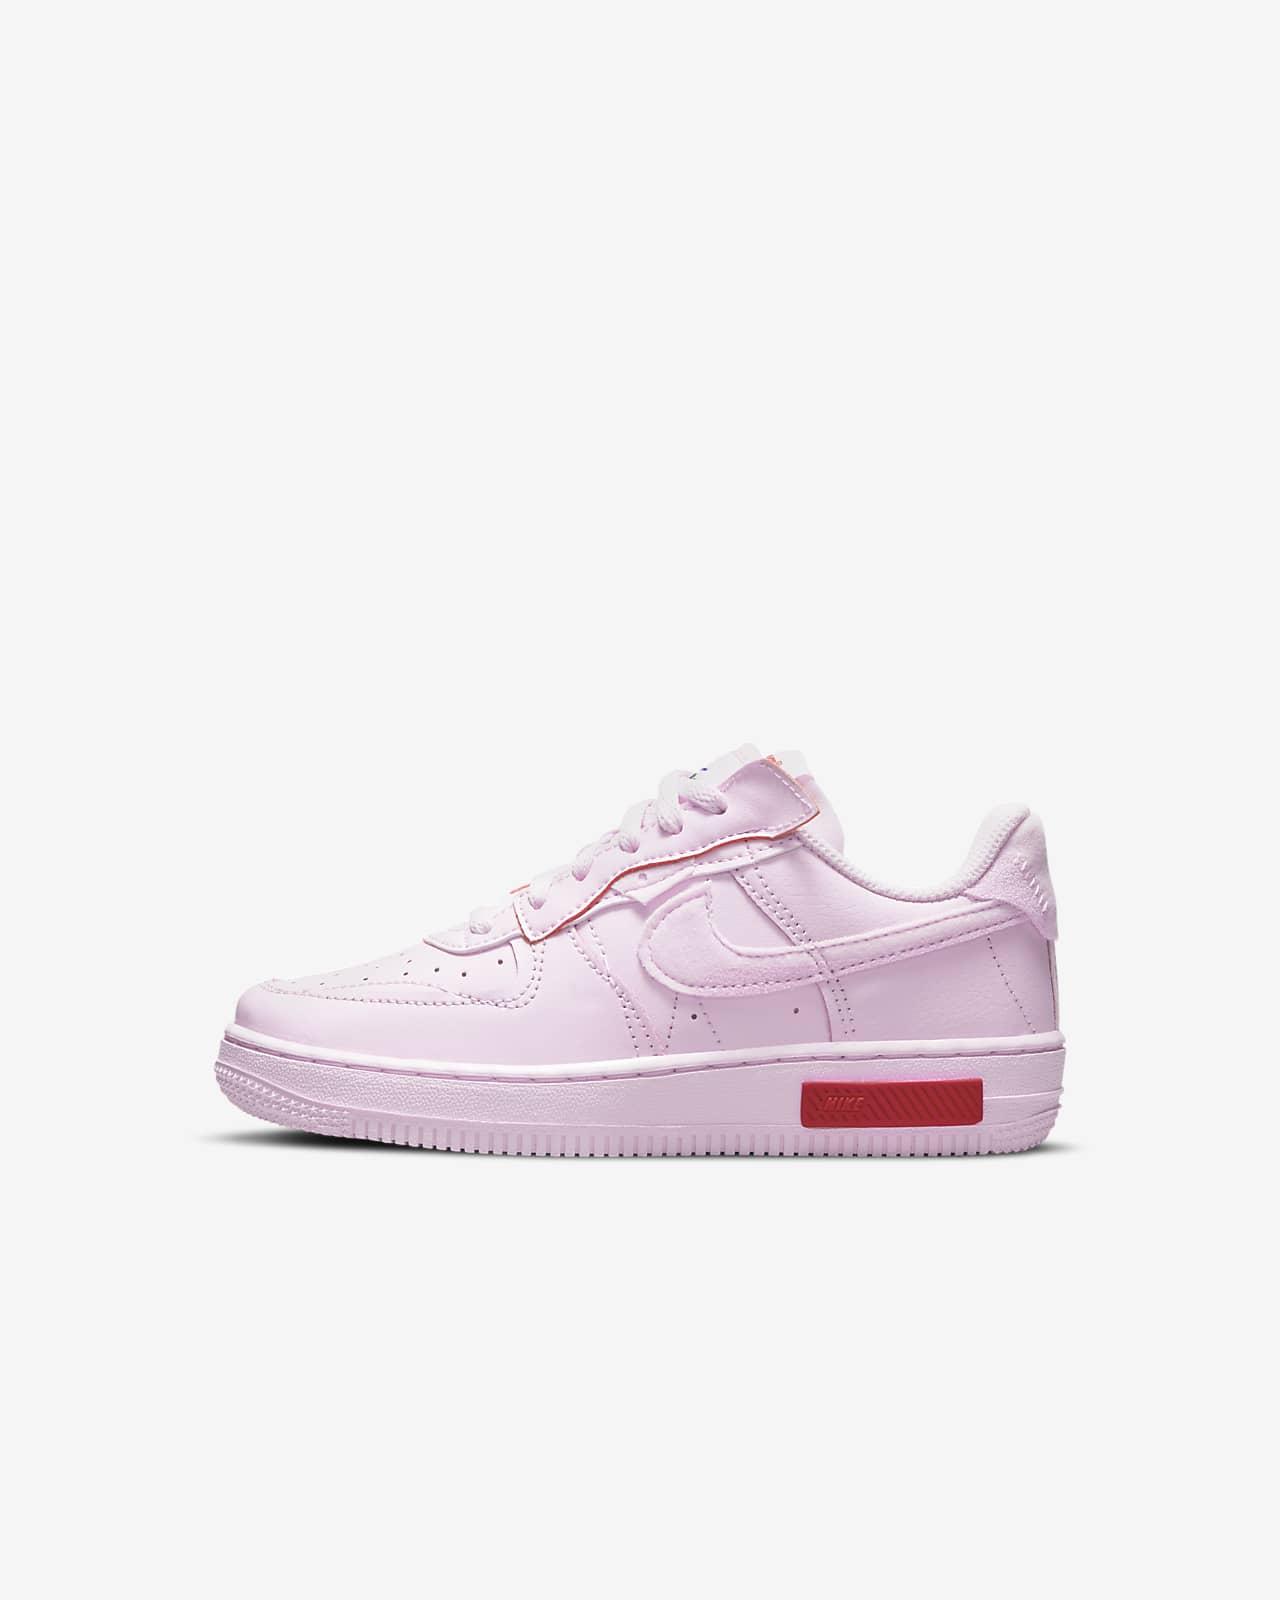 Chaussure Nike Force 1 Fontanka pour Jeune enfant